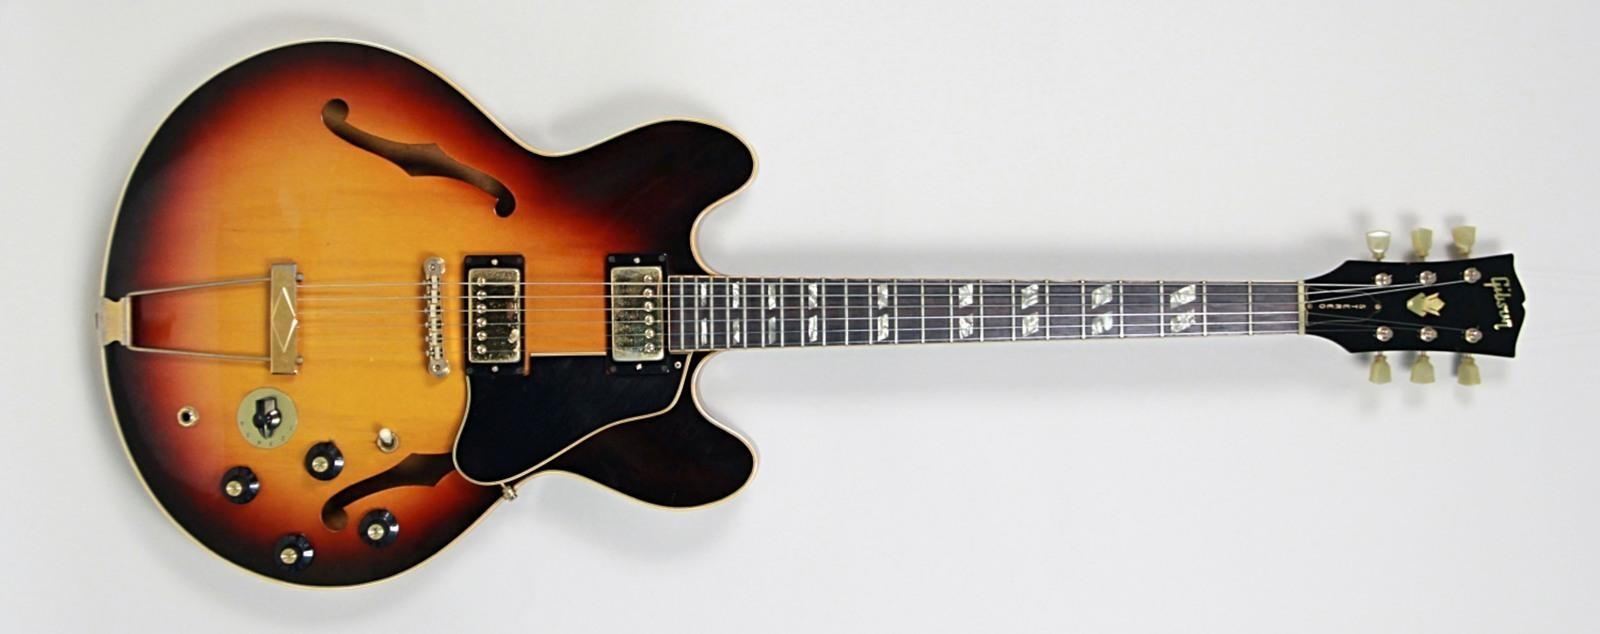 Gibson Guitars For Sale >> 1968 Gibson ES 345 - Vintage & Modern Guitars